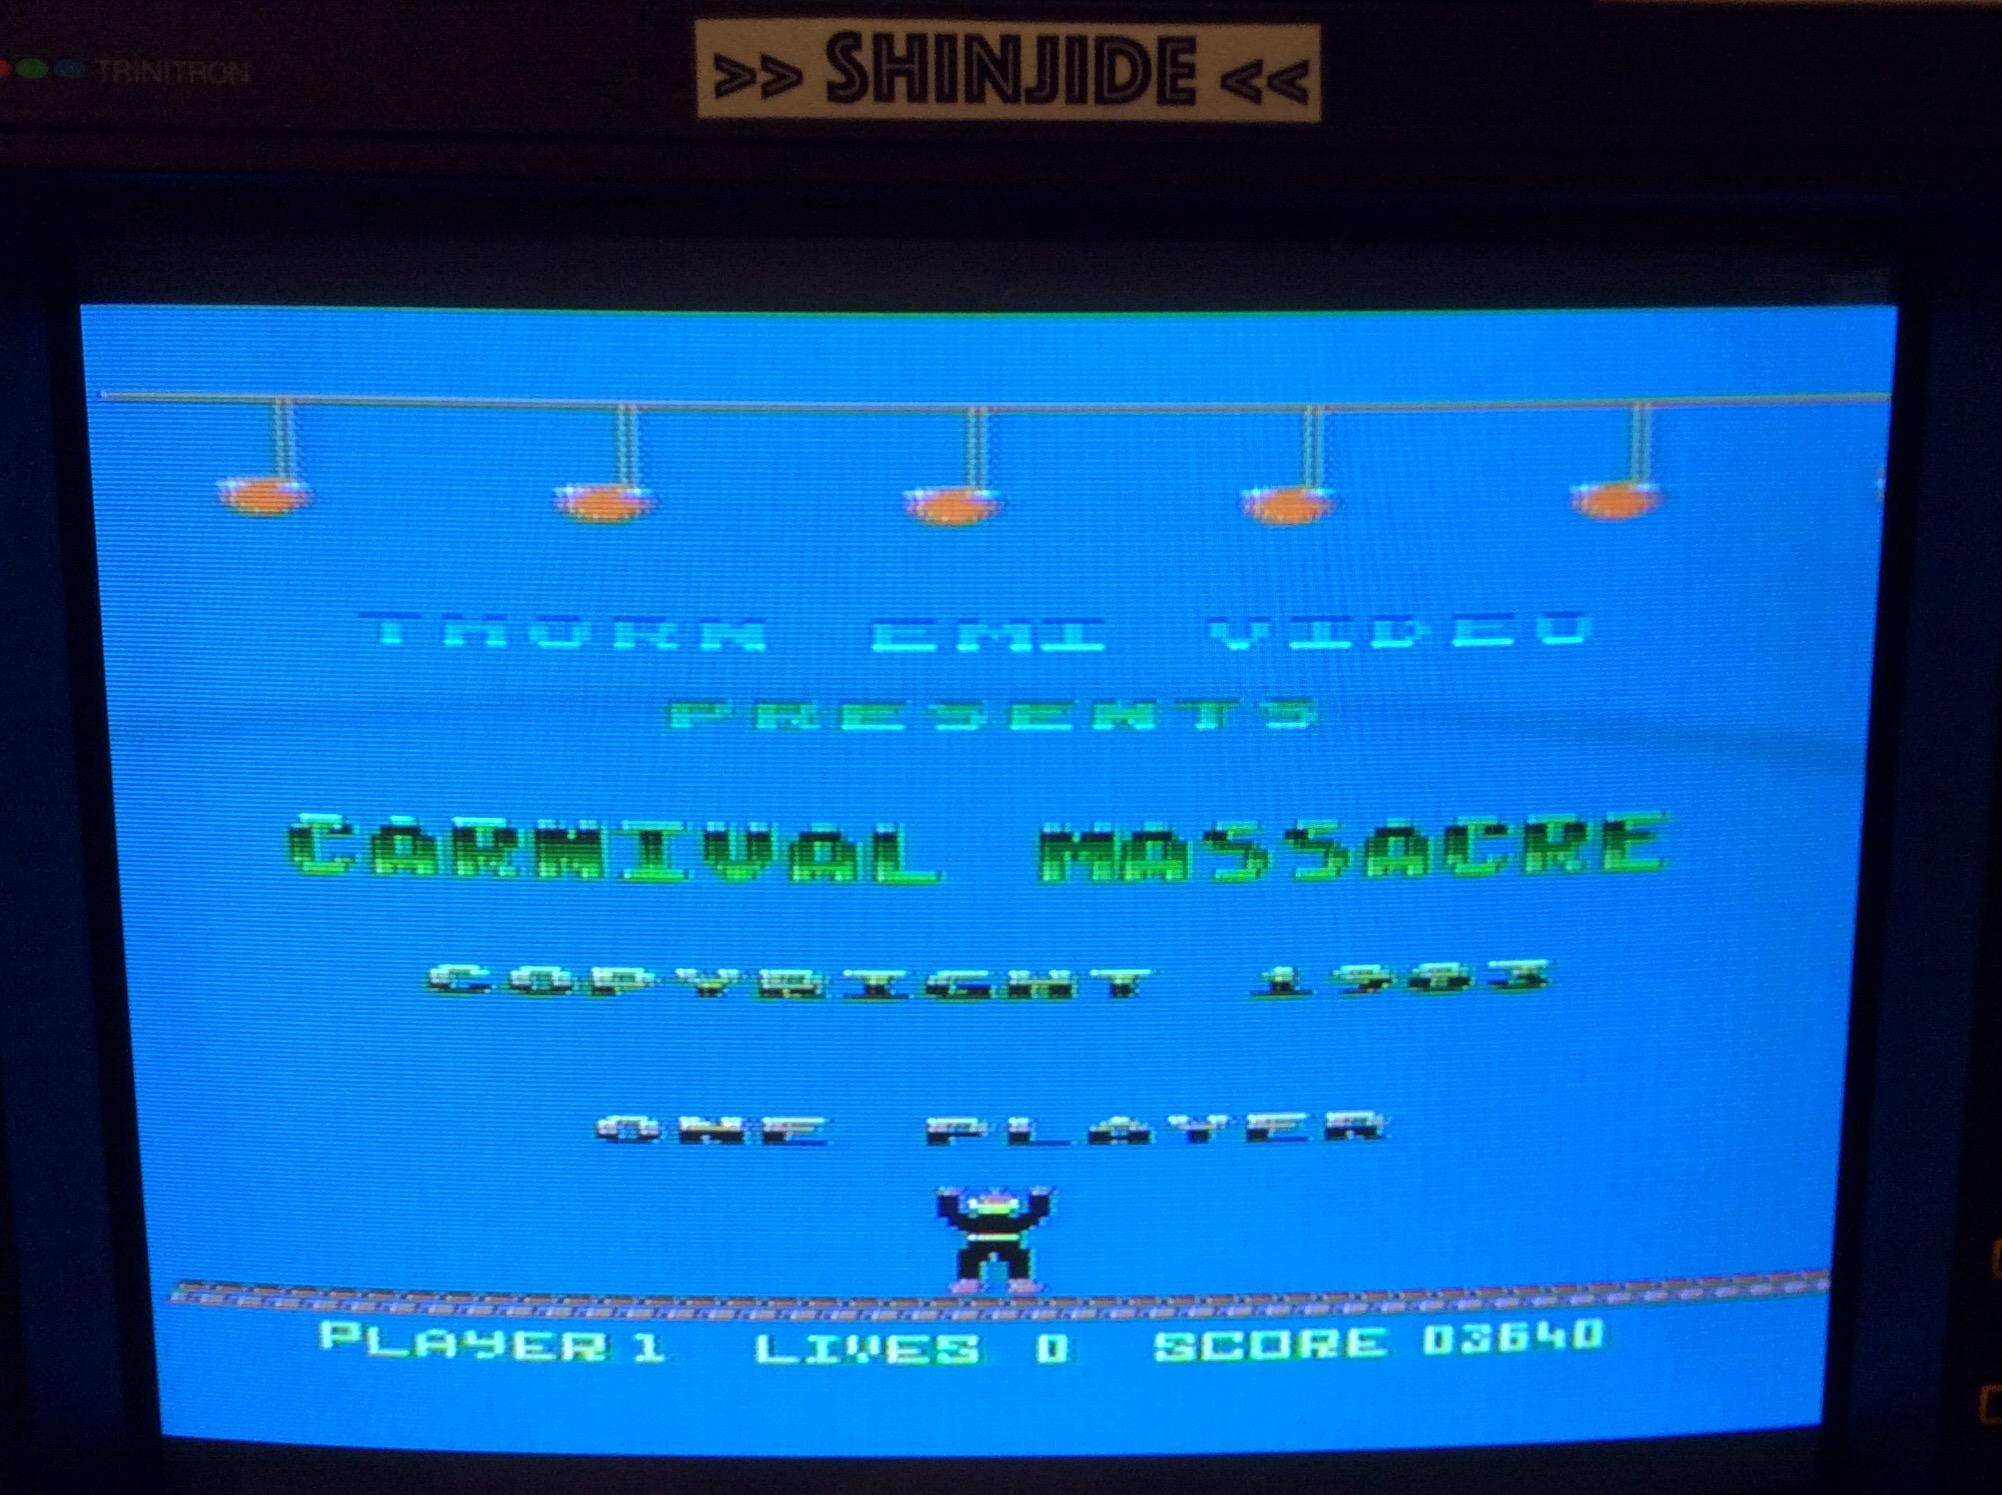 SHiNjide: Carnival Massacre (Atari 400/800/XL/XE) 3,640 points on 2015-11-09 14:30:48